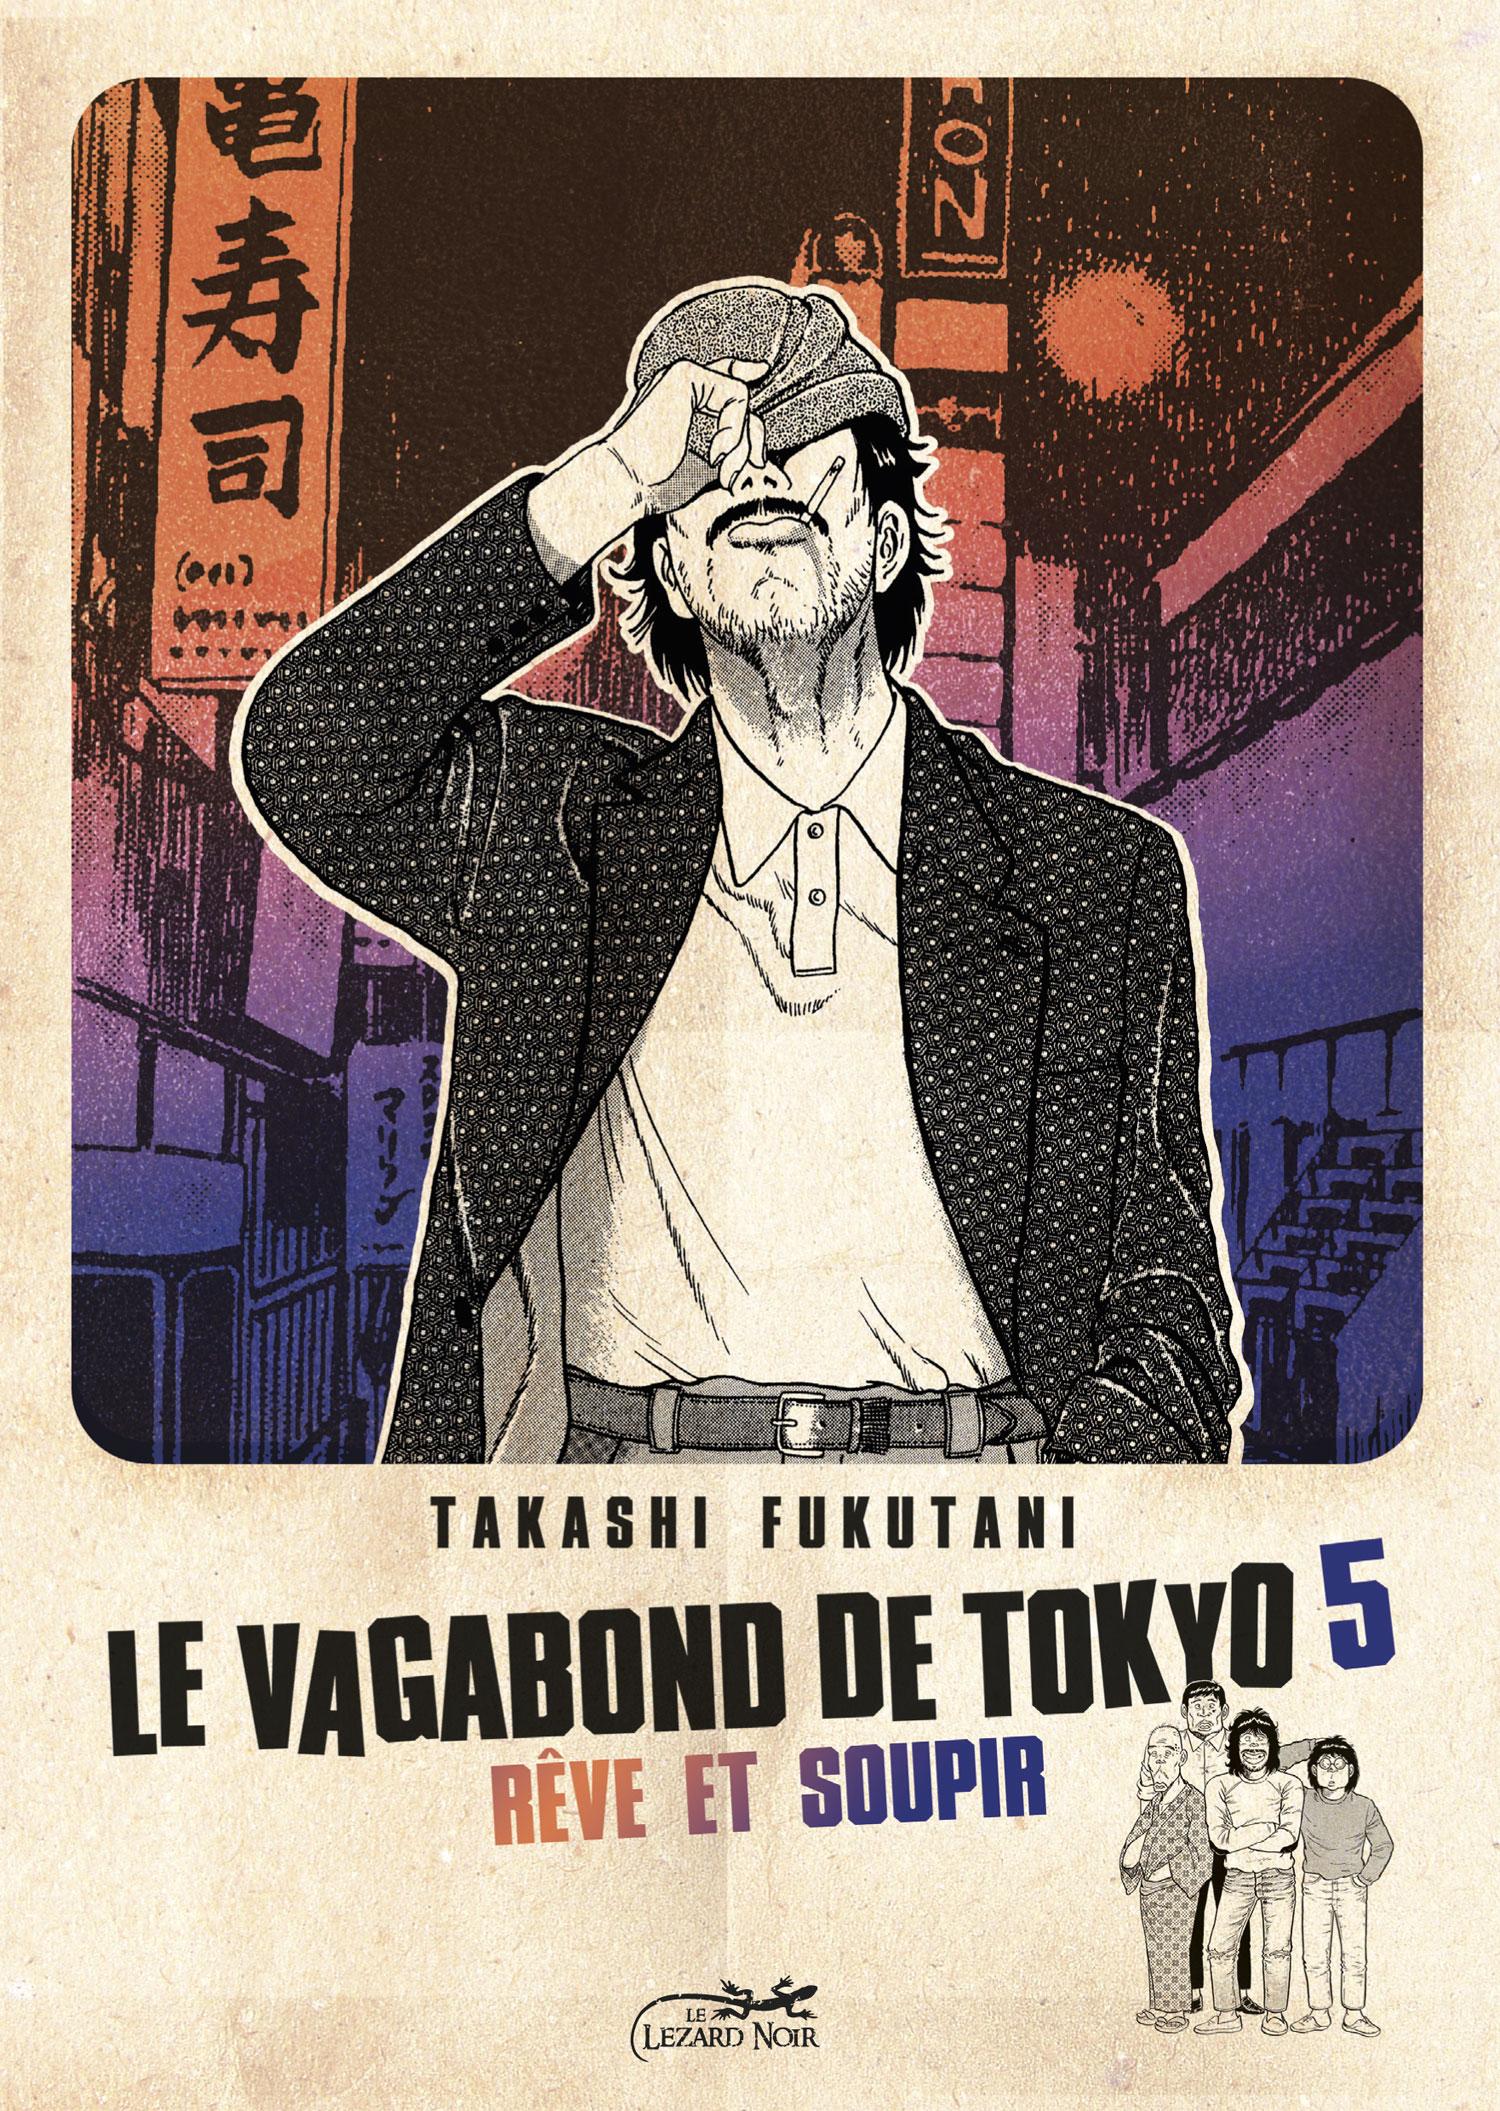 Couverture Le vagabond de Tokyo t.5 © 1979 Takashi Fukutani, Hobunsha, 2009 Le Lézard Noir